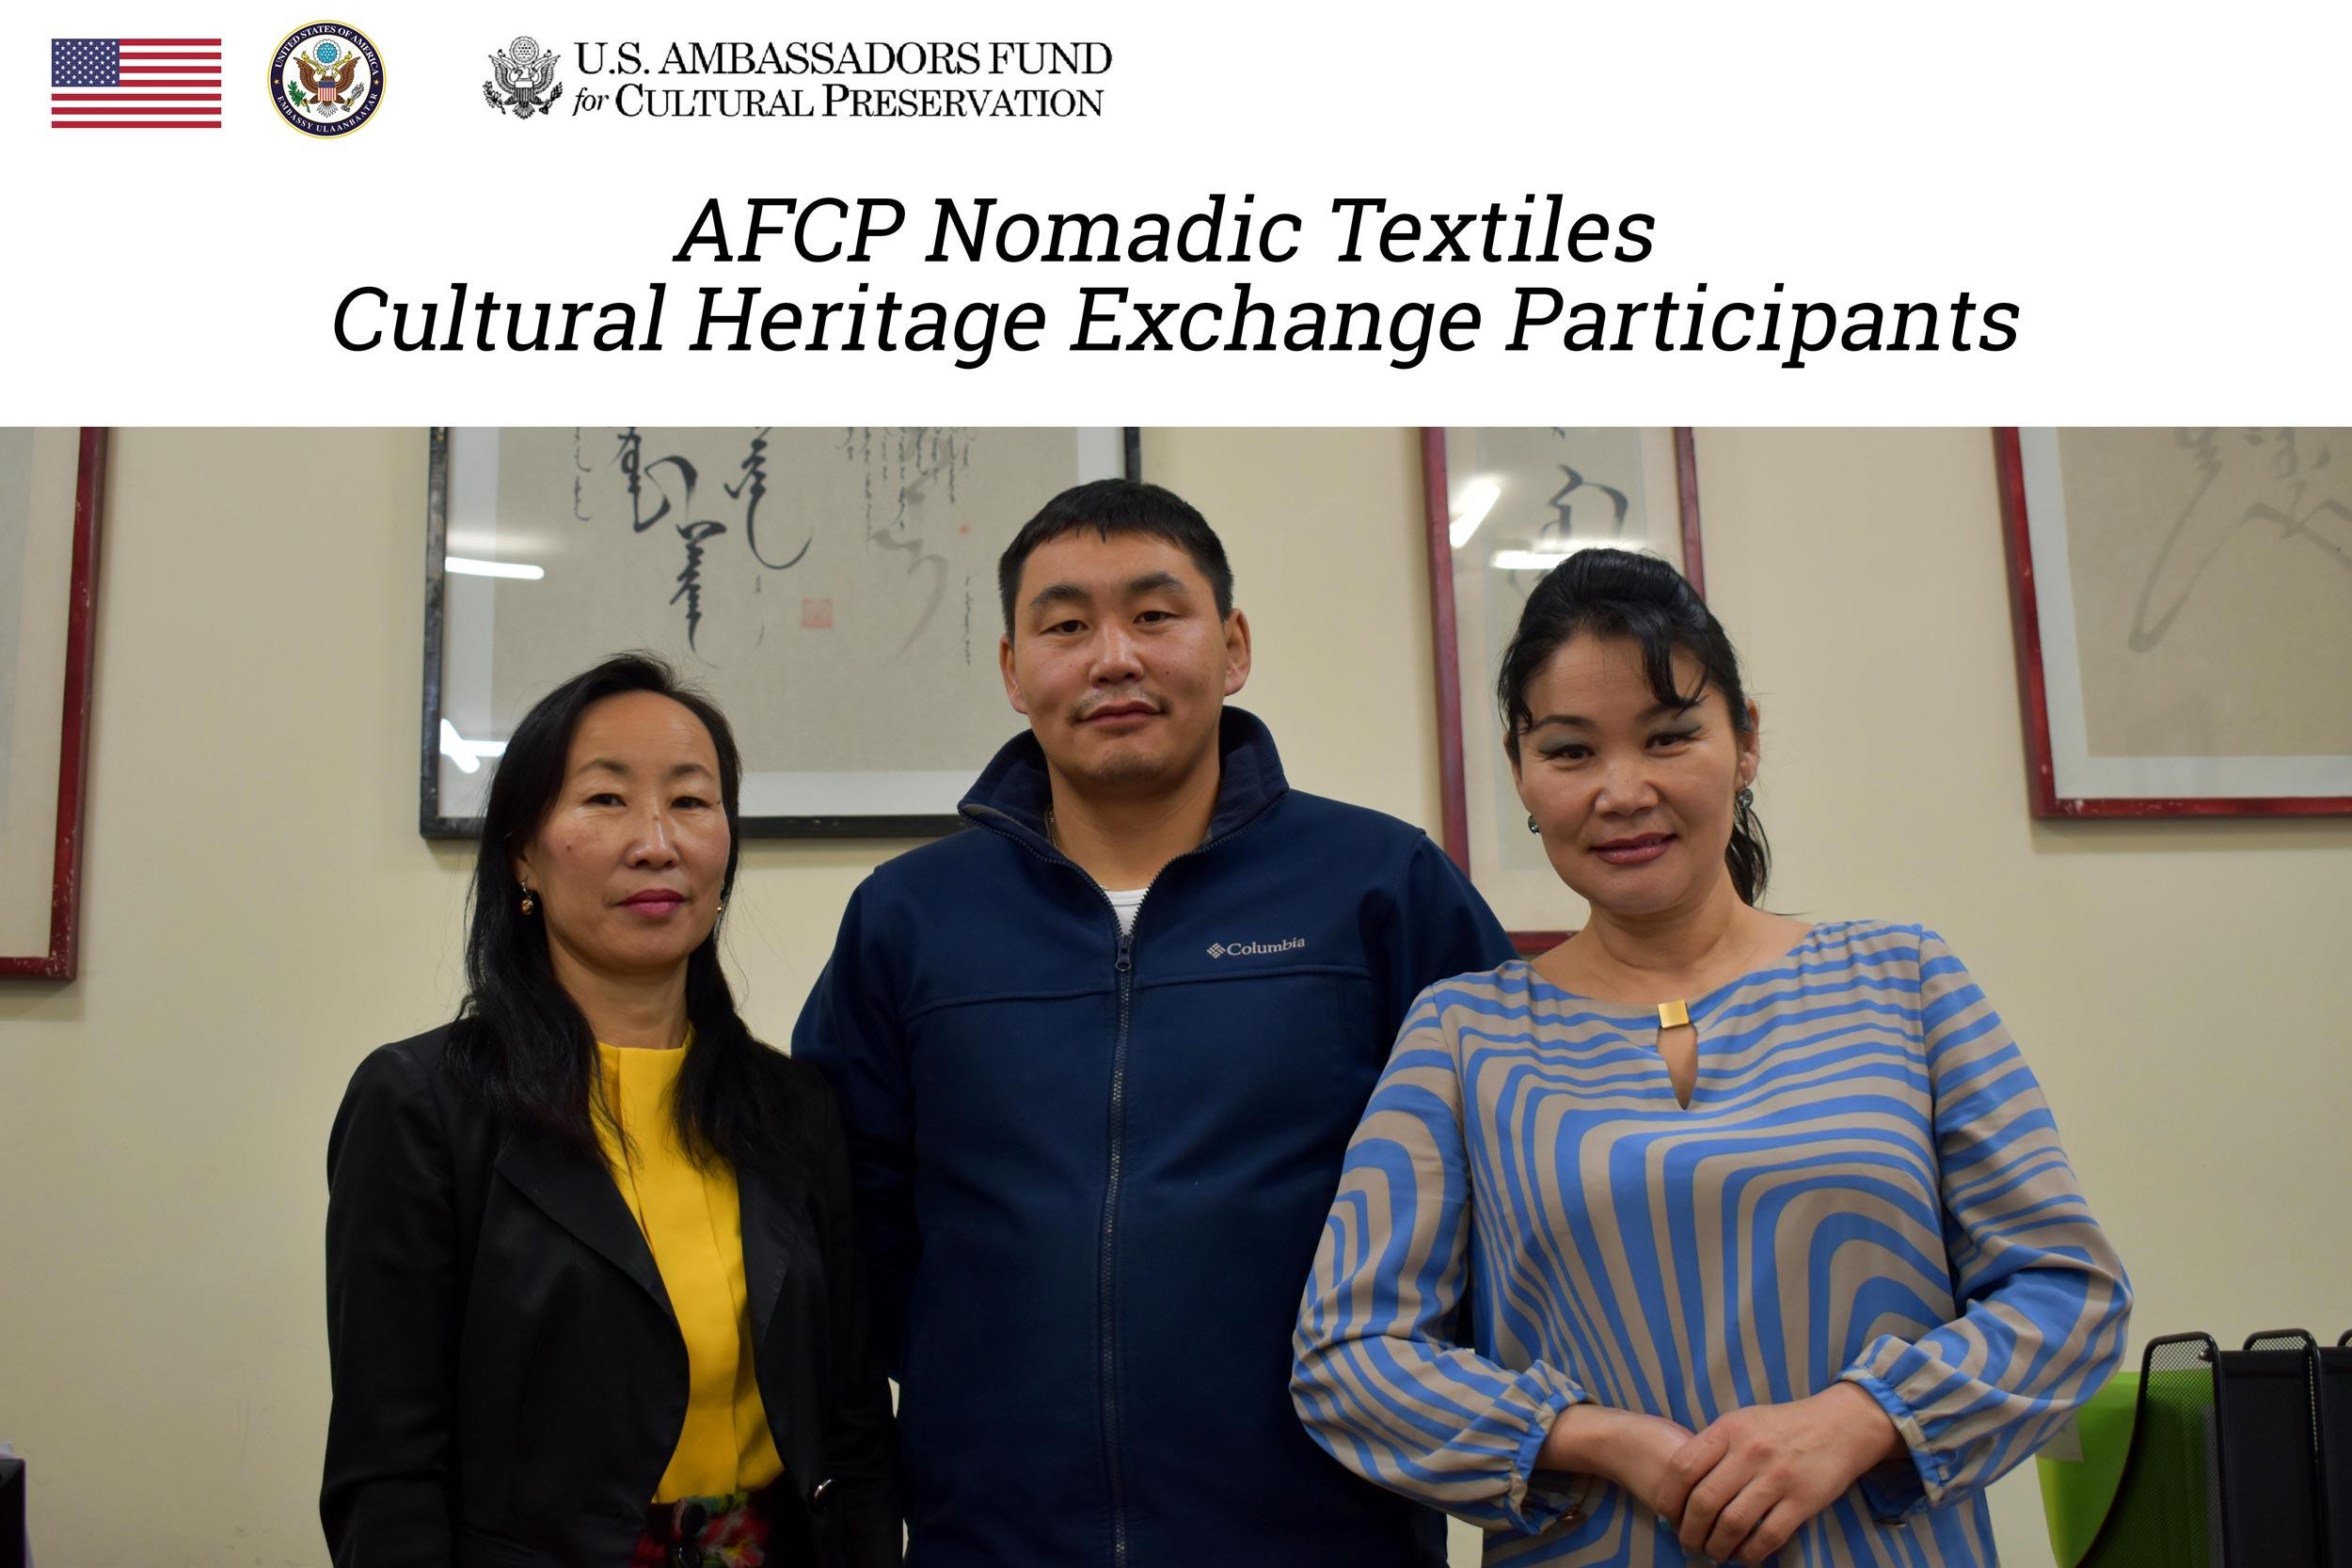 AFCP Nomadic Textiles Cultural Heritage Exchange Participants